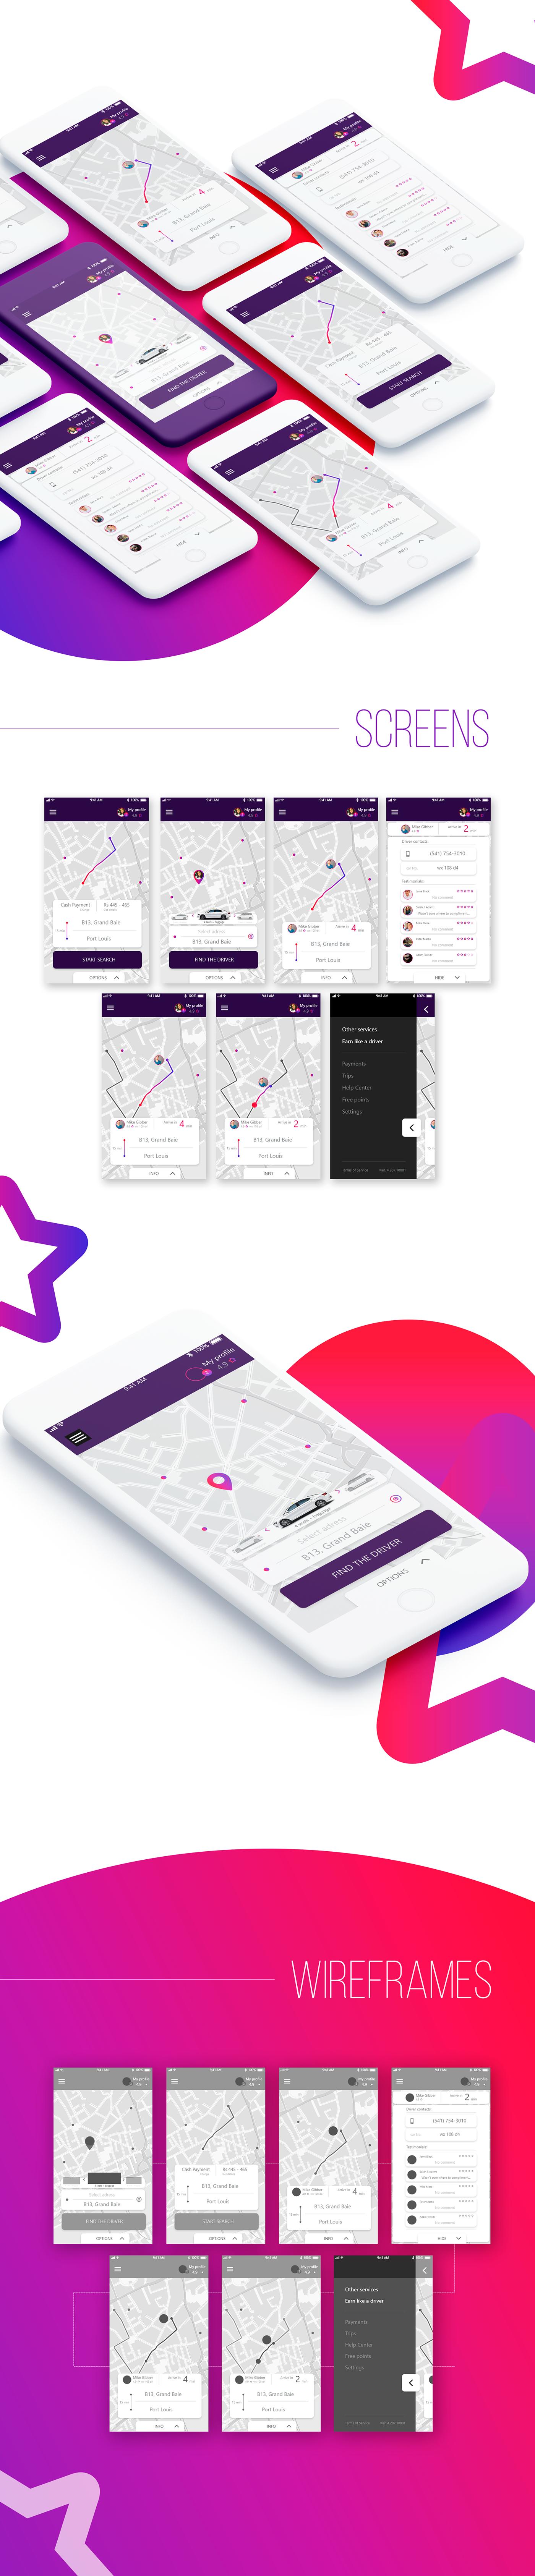 taxi app ios ux UI Uber iphone